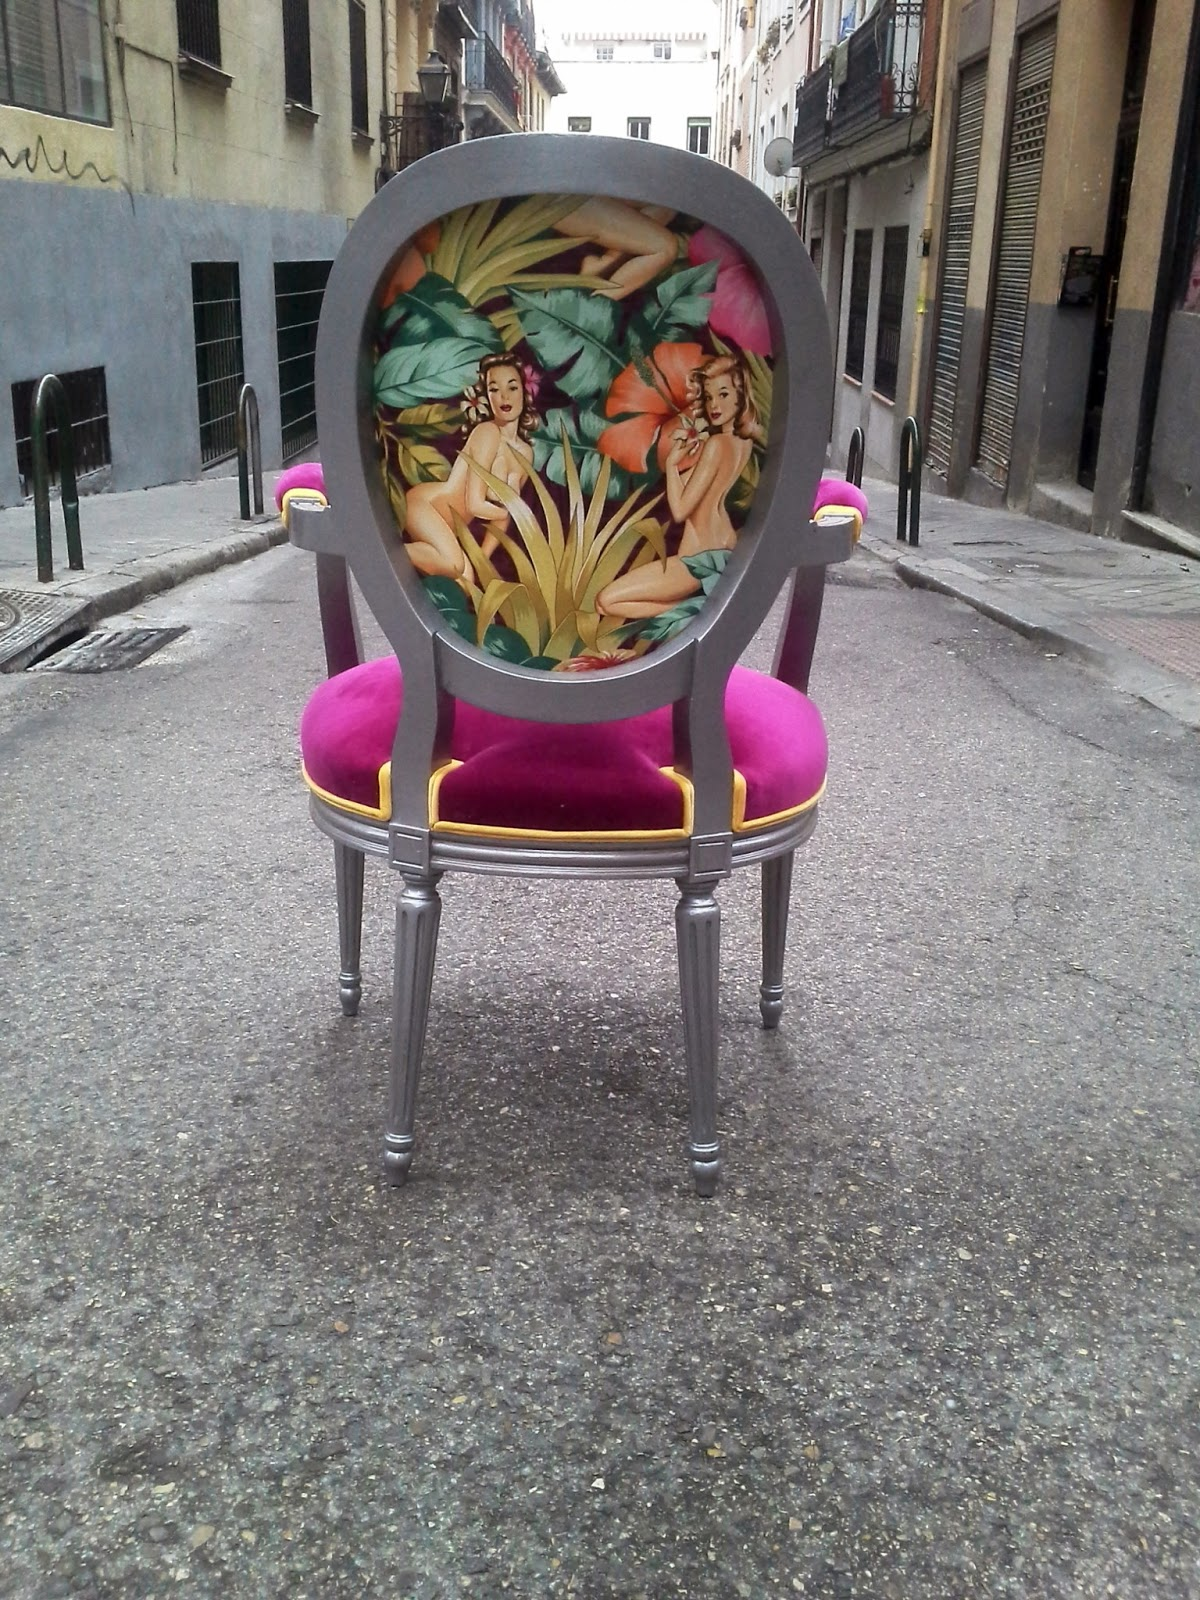 Silla luis xvi tapizada con tela de pin ups la tapicera - Tapizado de sillas antiguas ...